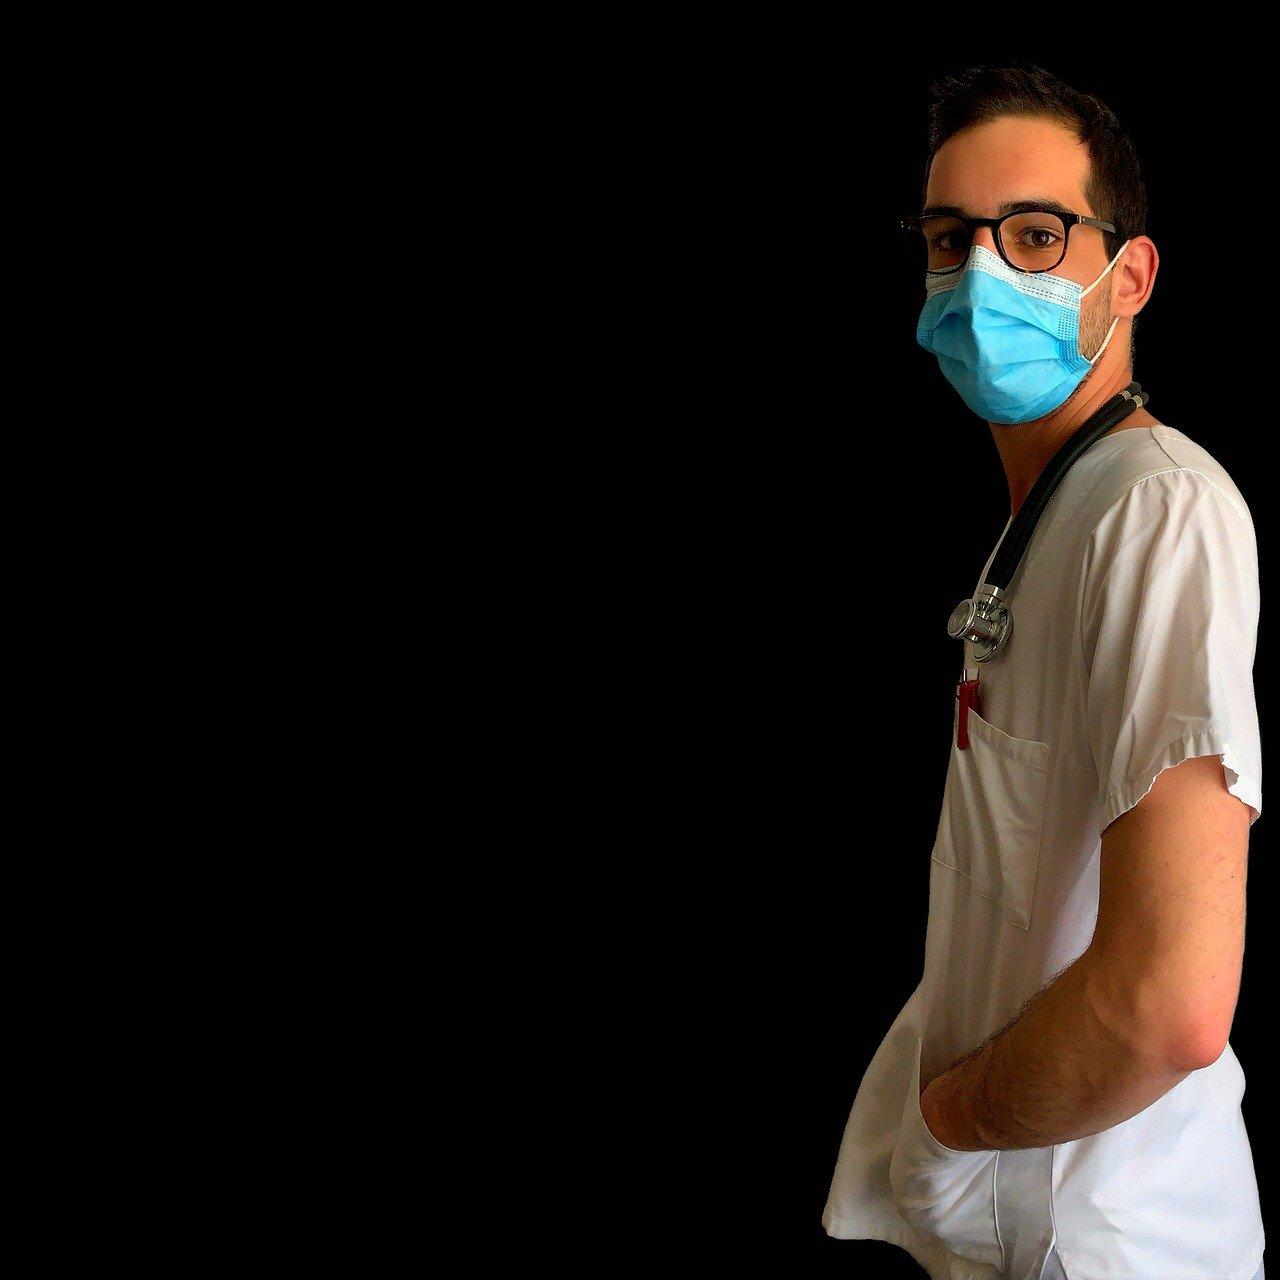 Krüs M A D Huisartsenpraktijk diarree huisarts